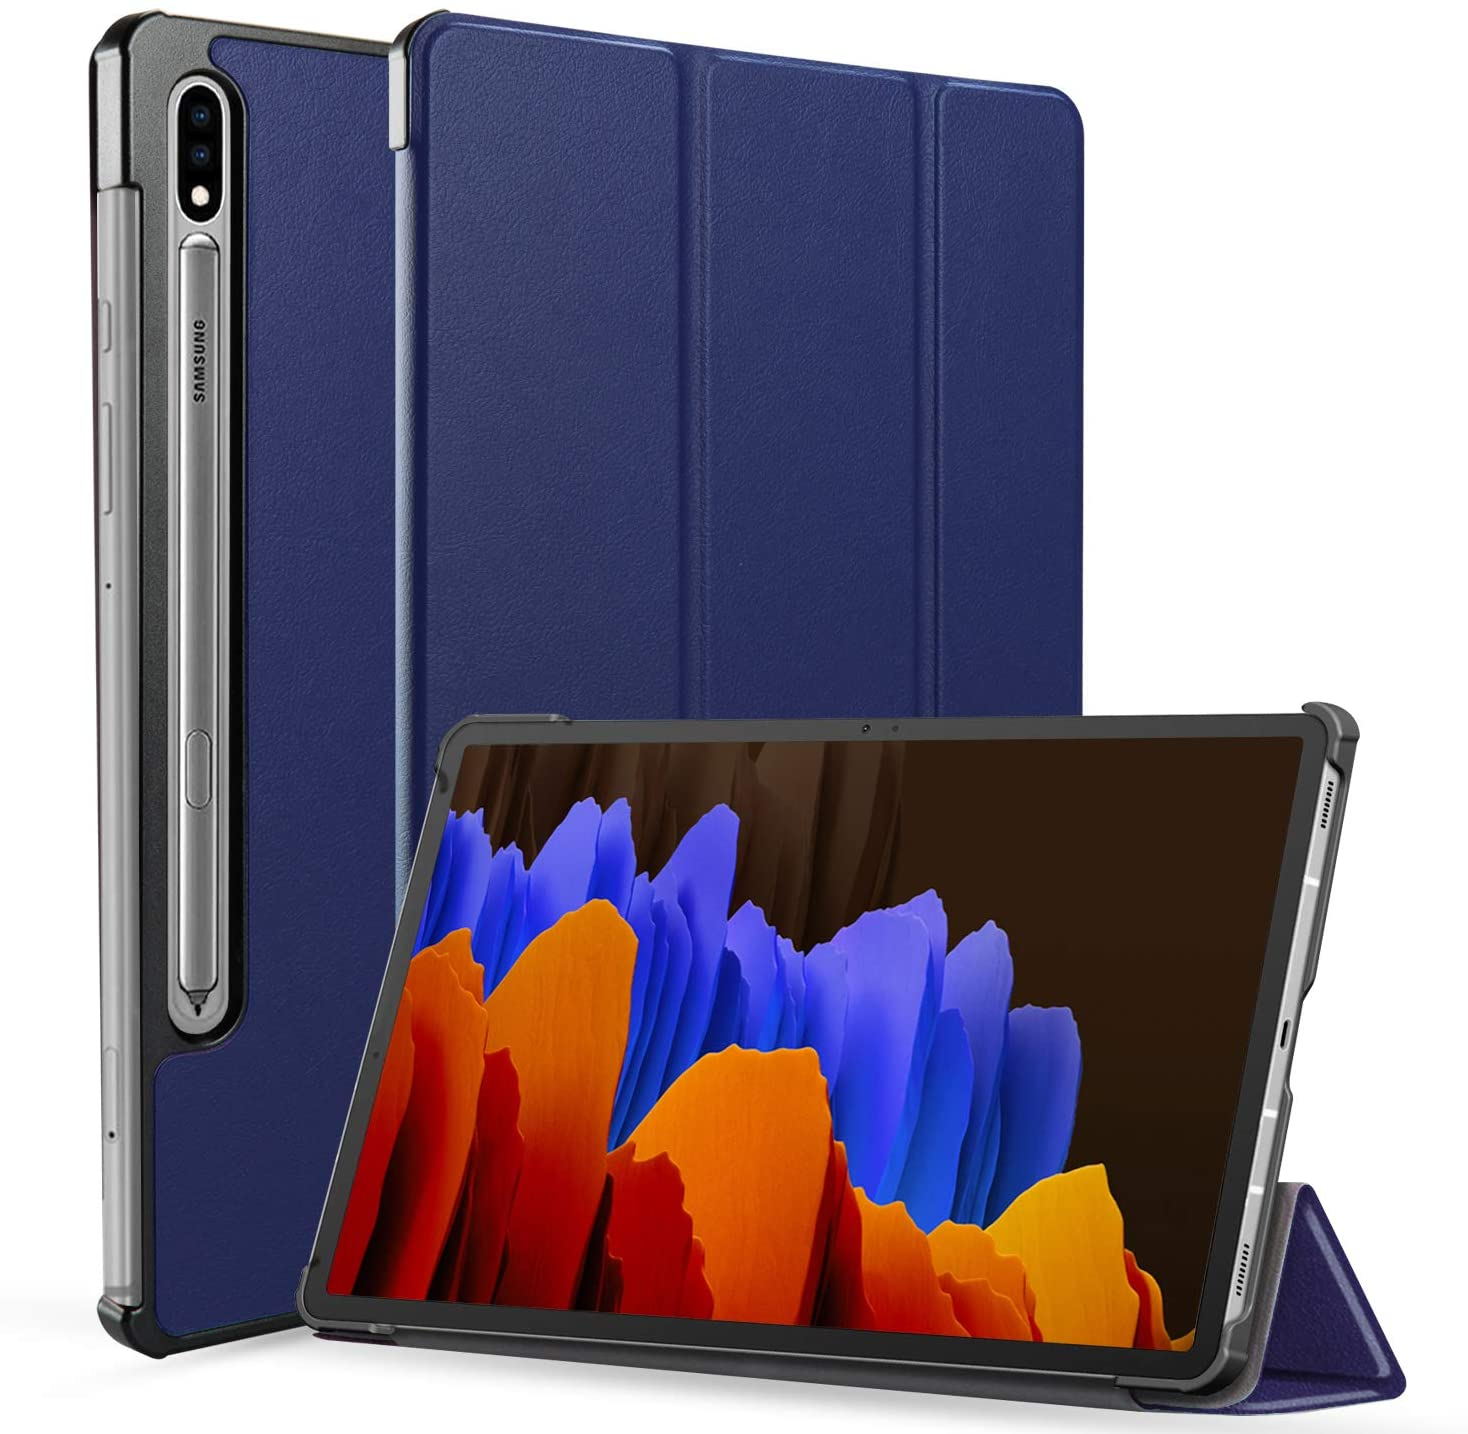 Neepanda Case for Galaxy Tab S7 Plus 12.4 Inch, Slim Tri-Fold Smart Case Cover for Samsung Galaxy Tab S7 Plus 12.4-inch 2020 Release Model SM-T970/T975/T976, [Auto Wake/Sleep] - Blue